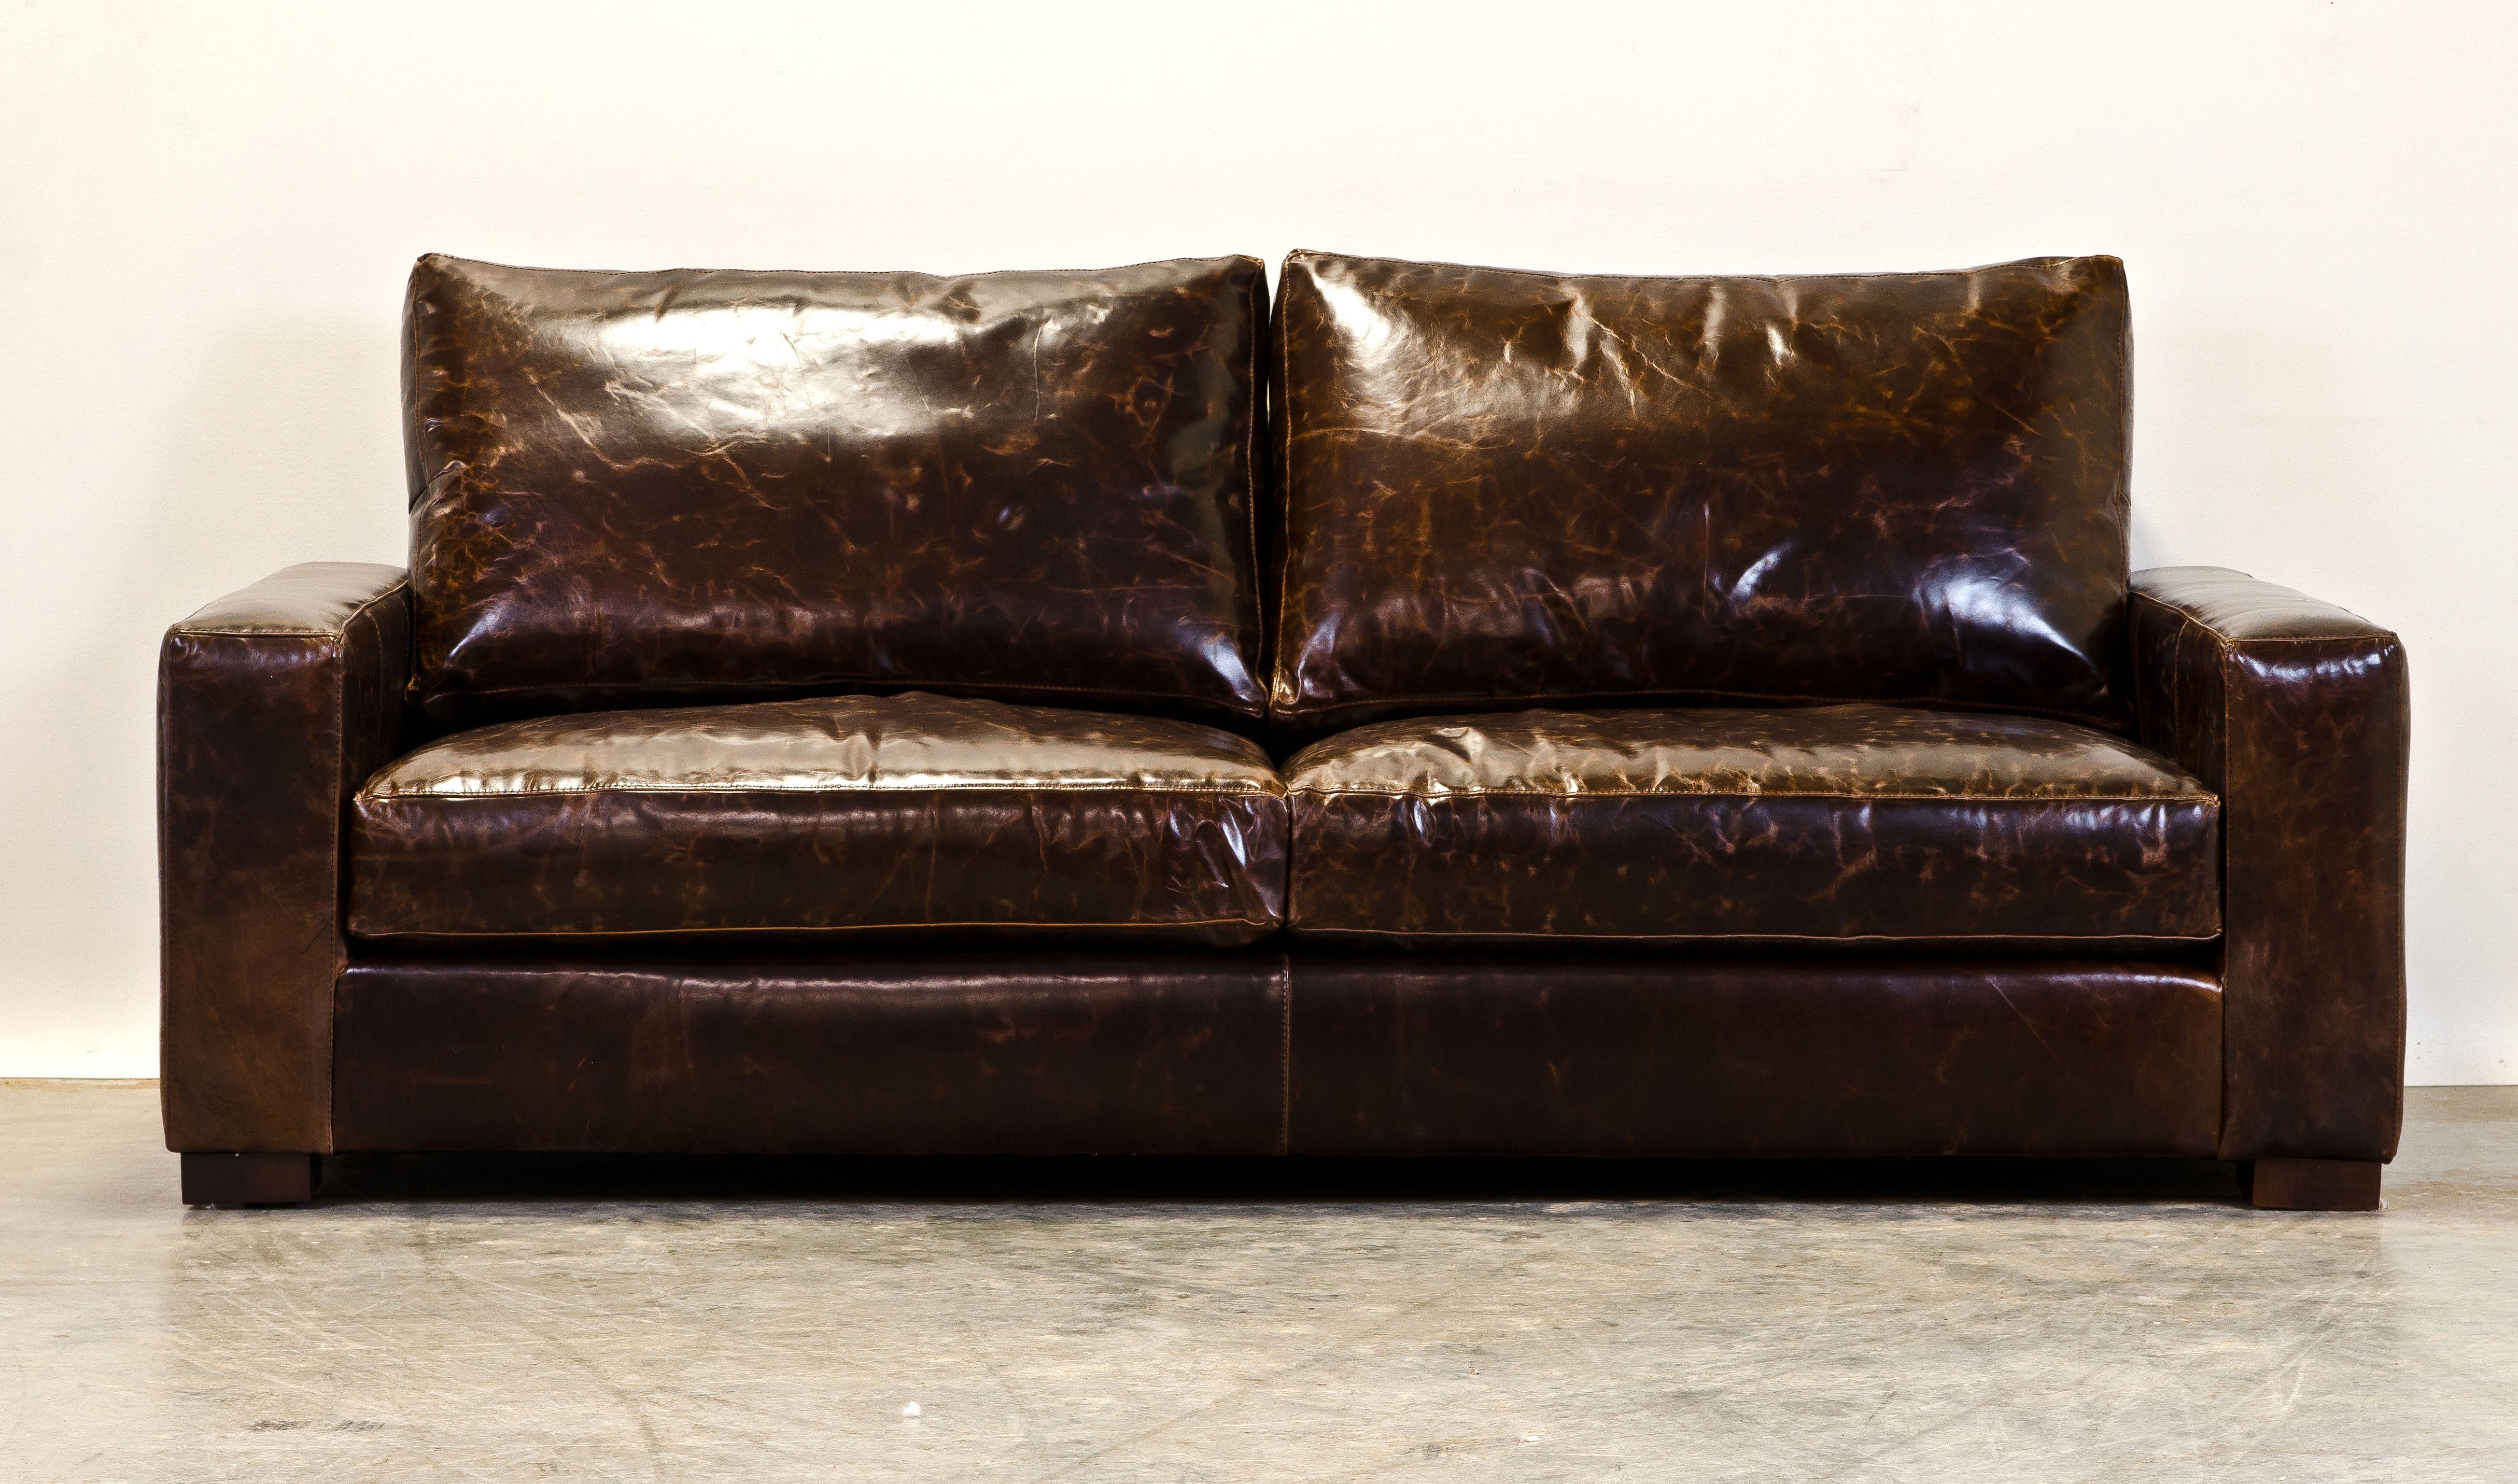 Restoration Hardware Maxwell Sofa vs COCOCO Home Monroe Sofa You